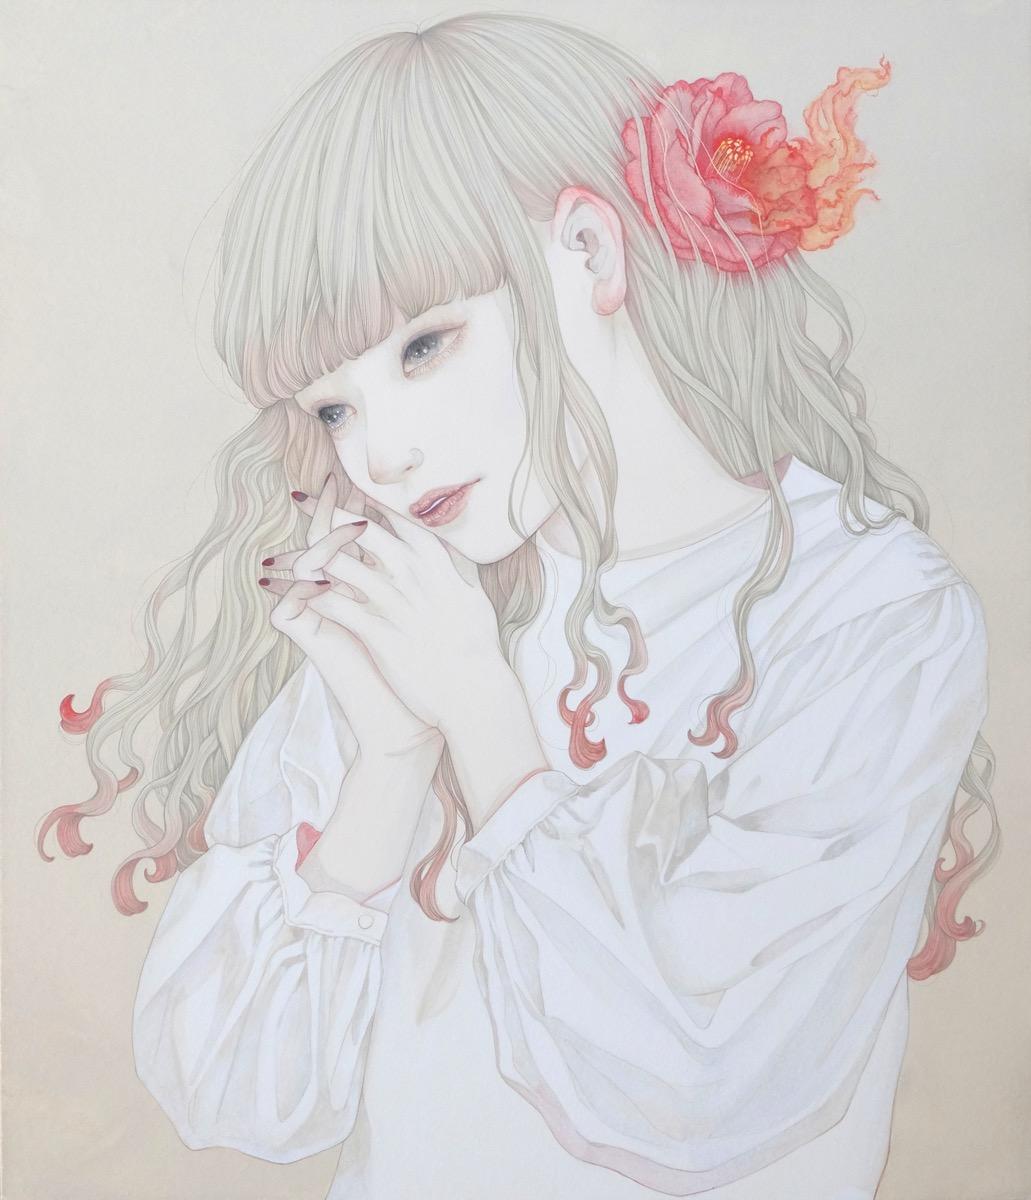 Yuka Sakuma 'Sink' (ink on paper (black ink rock paint on hemp paper), 20.8 x 17.9 inches)